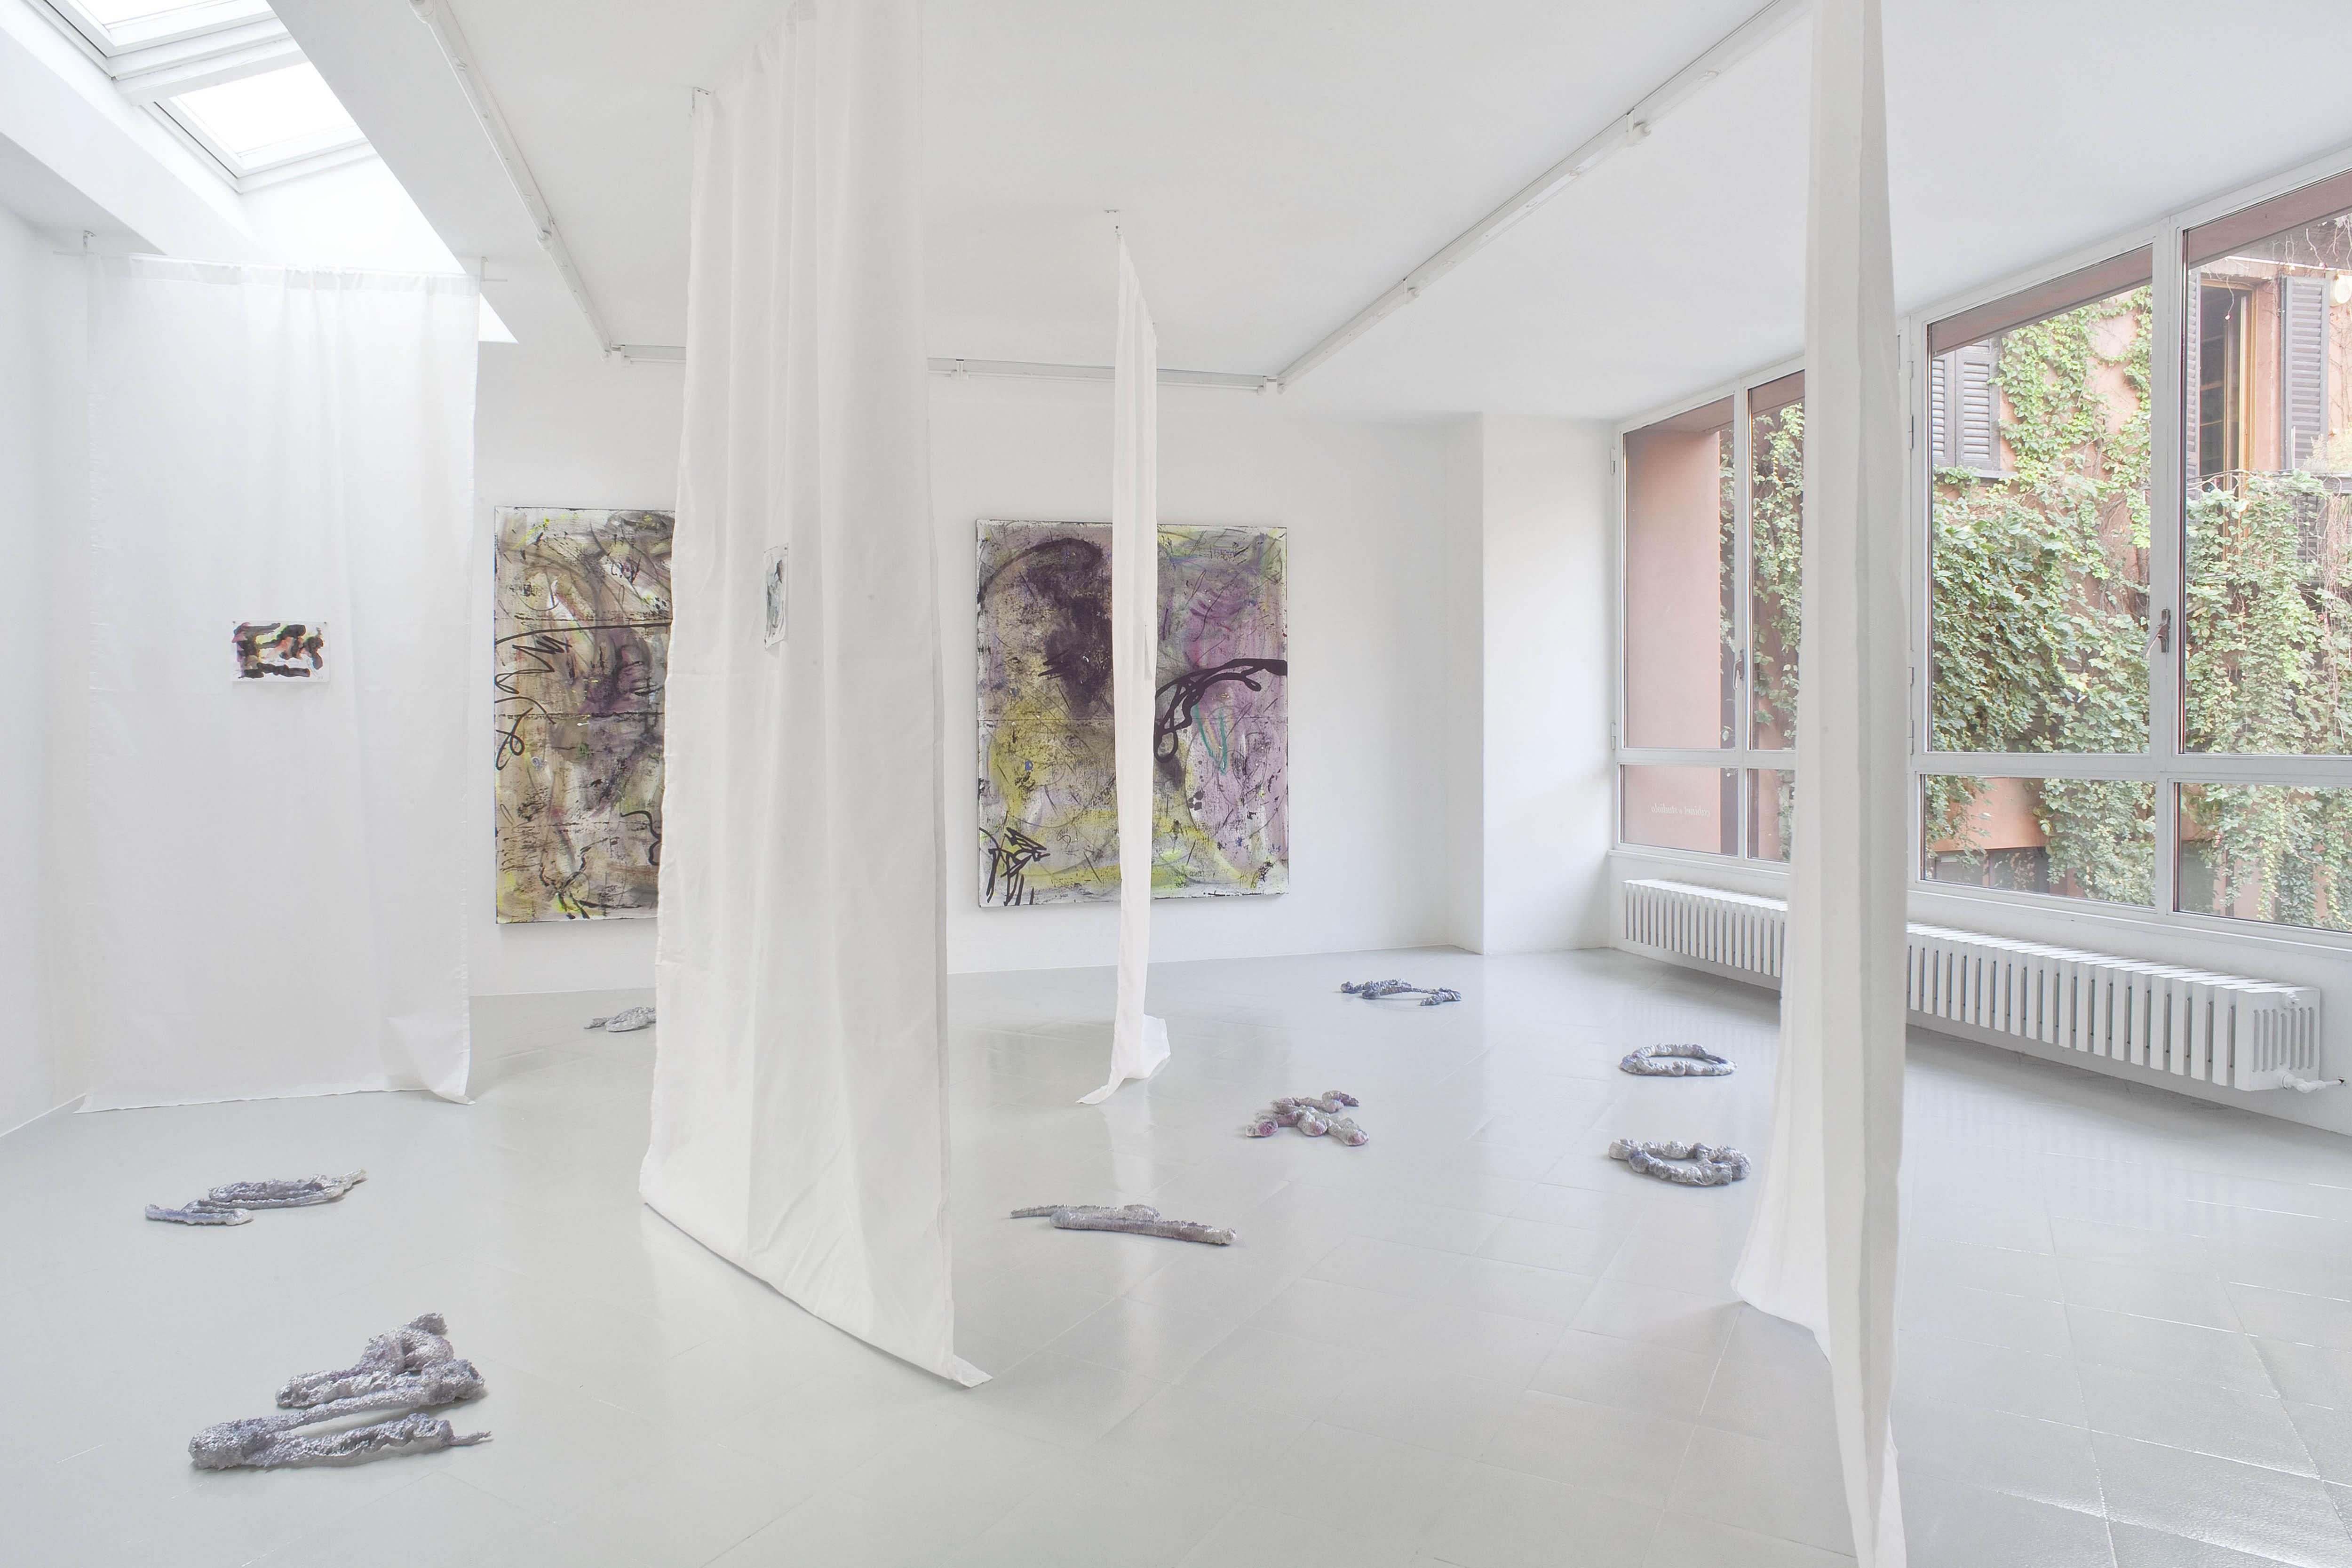 14 - Henning Strassburger Superet Exit System Installation View 2016 Studiolo Milan copia 2